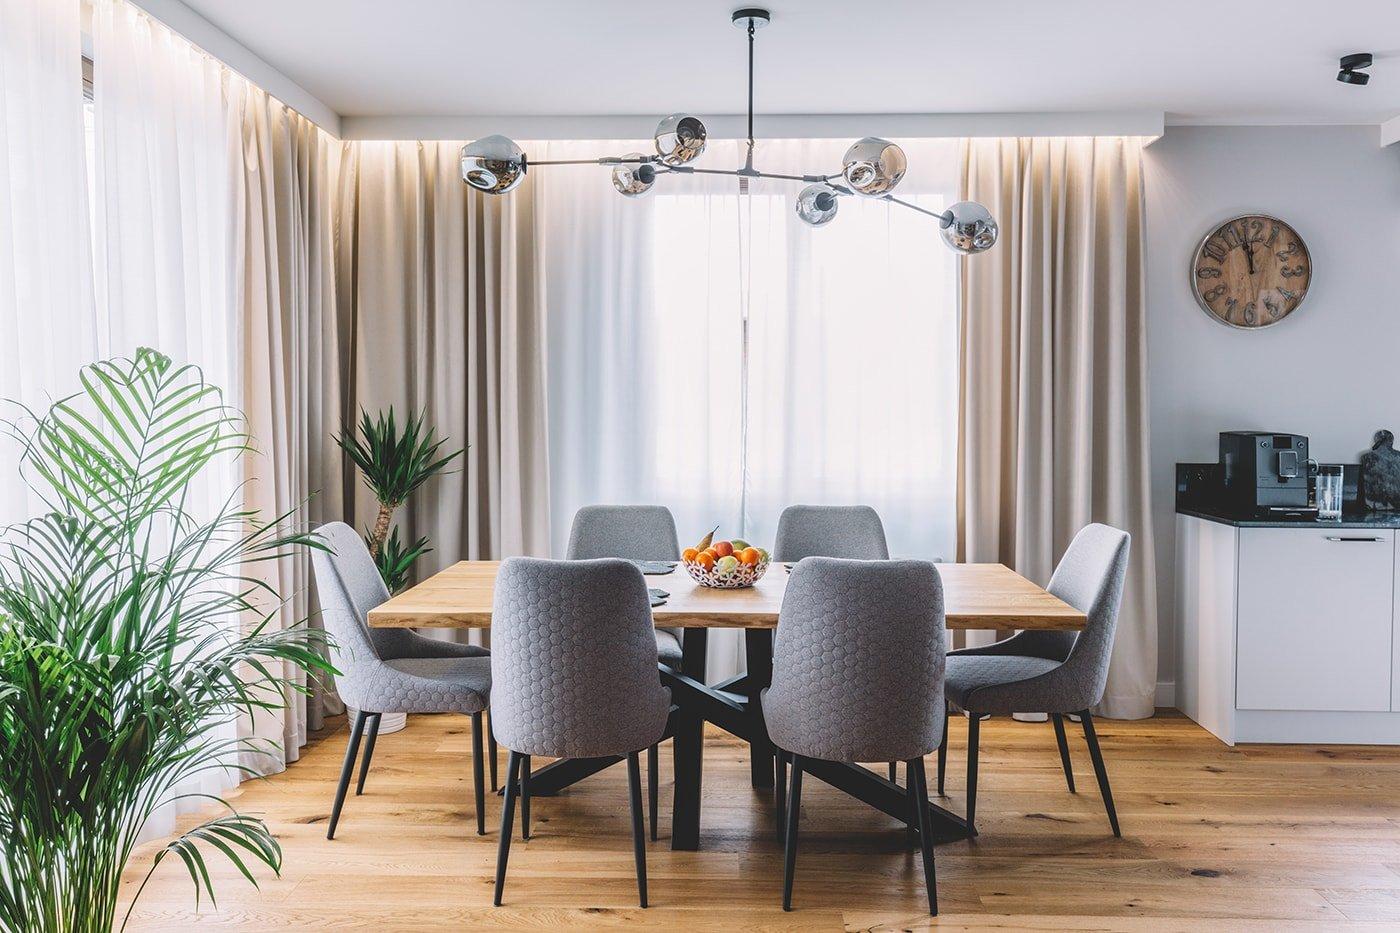 Modern apartment dining room